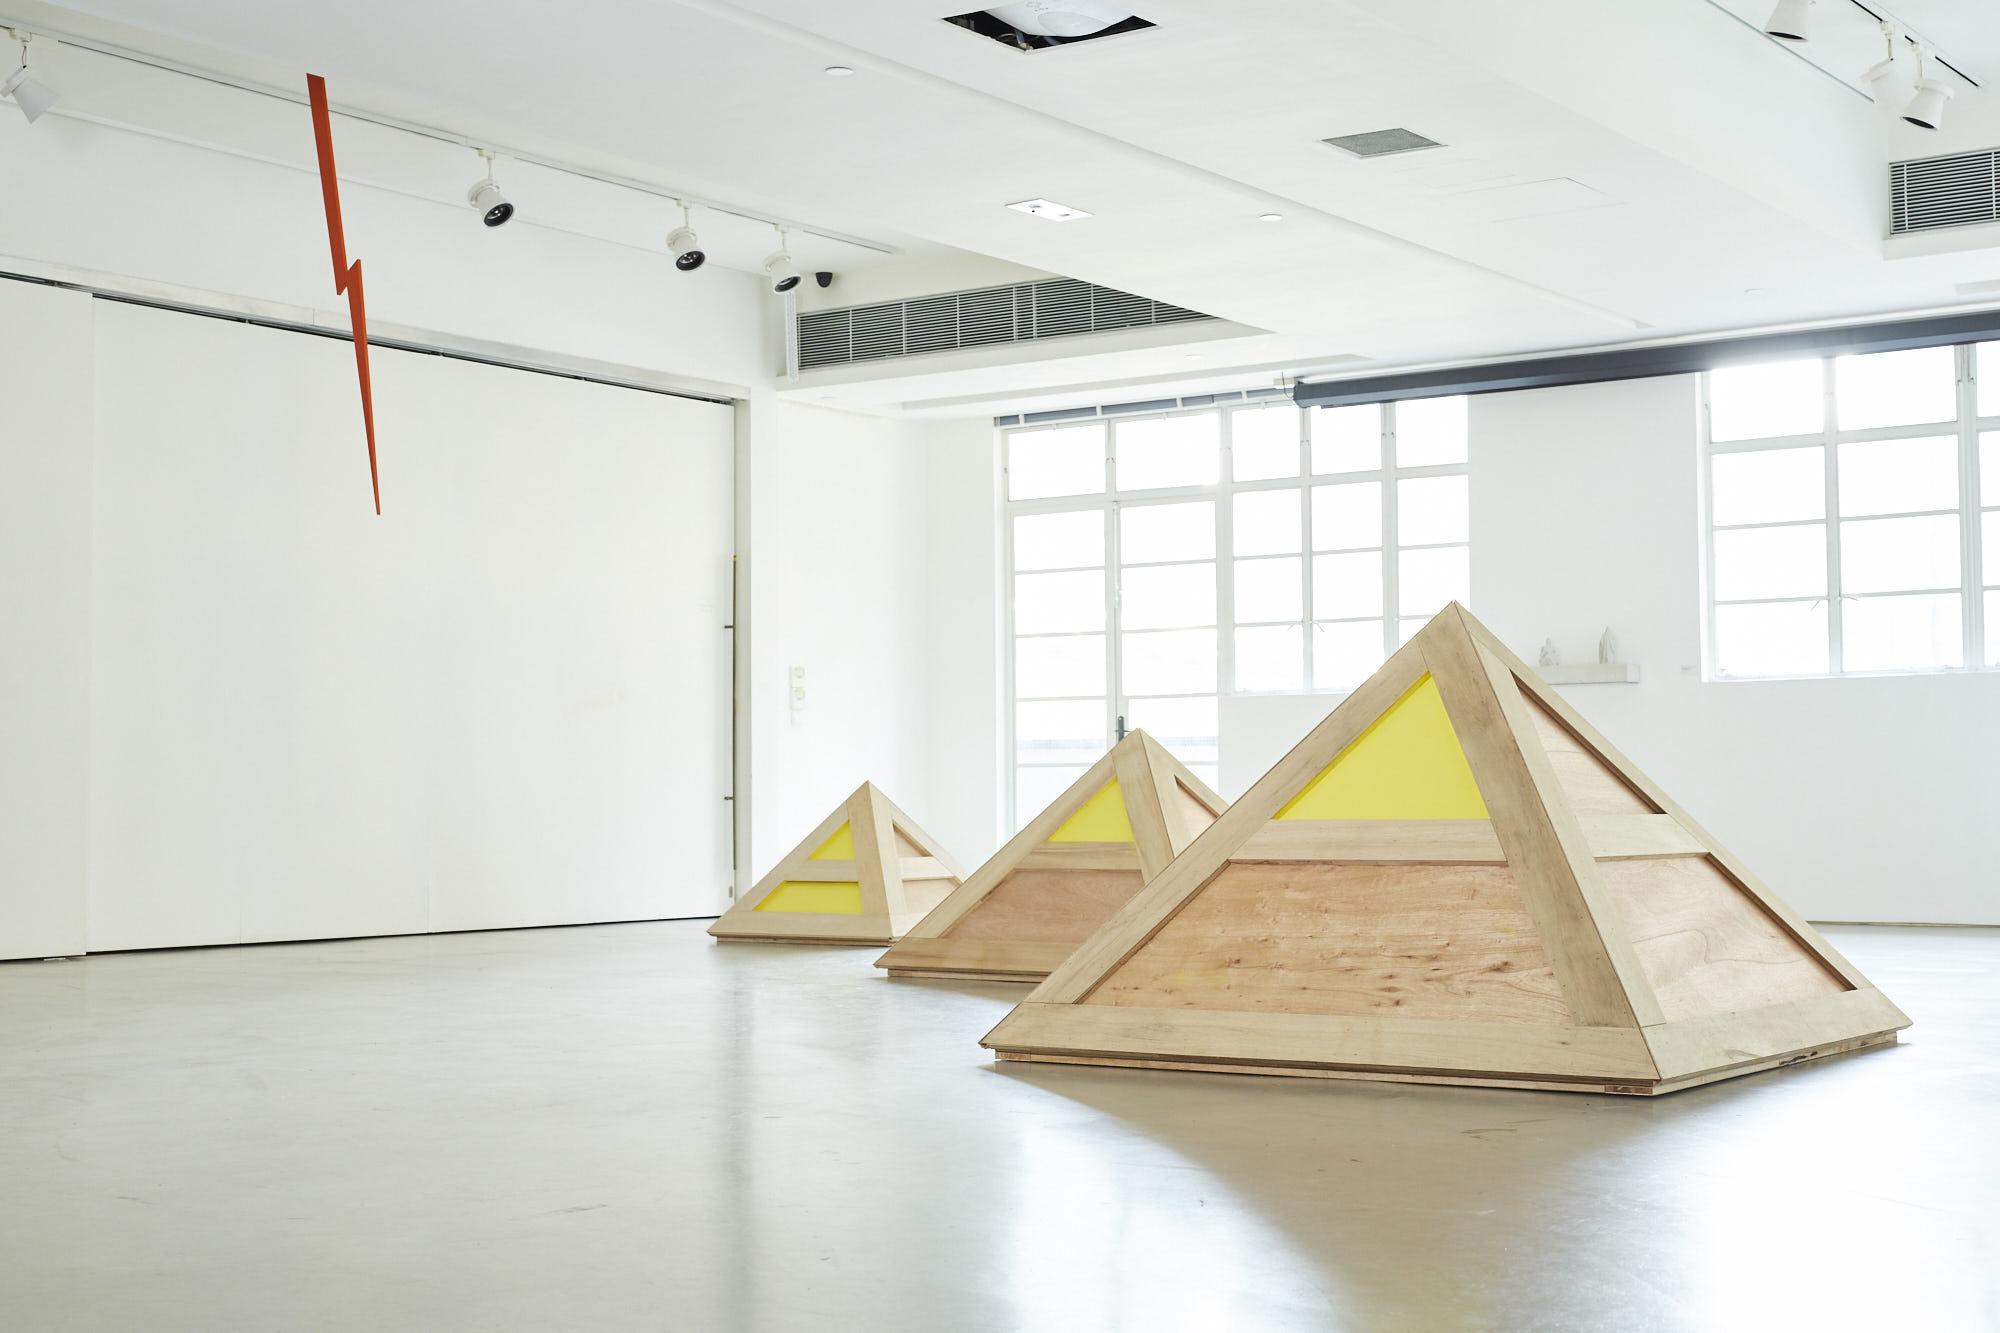 Wong Wai Yin (黃慧妍). 'Without Trying' Exhibition (Spring Workshop). Hong Kong. 2016